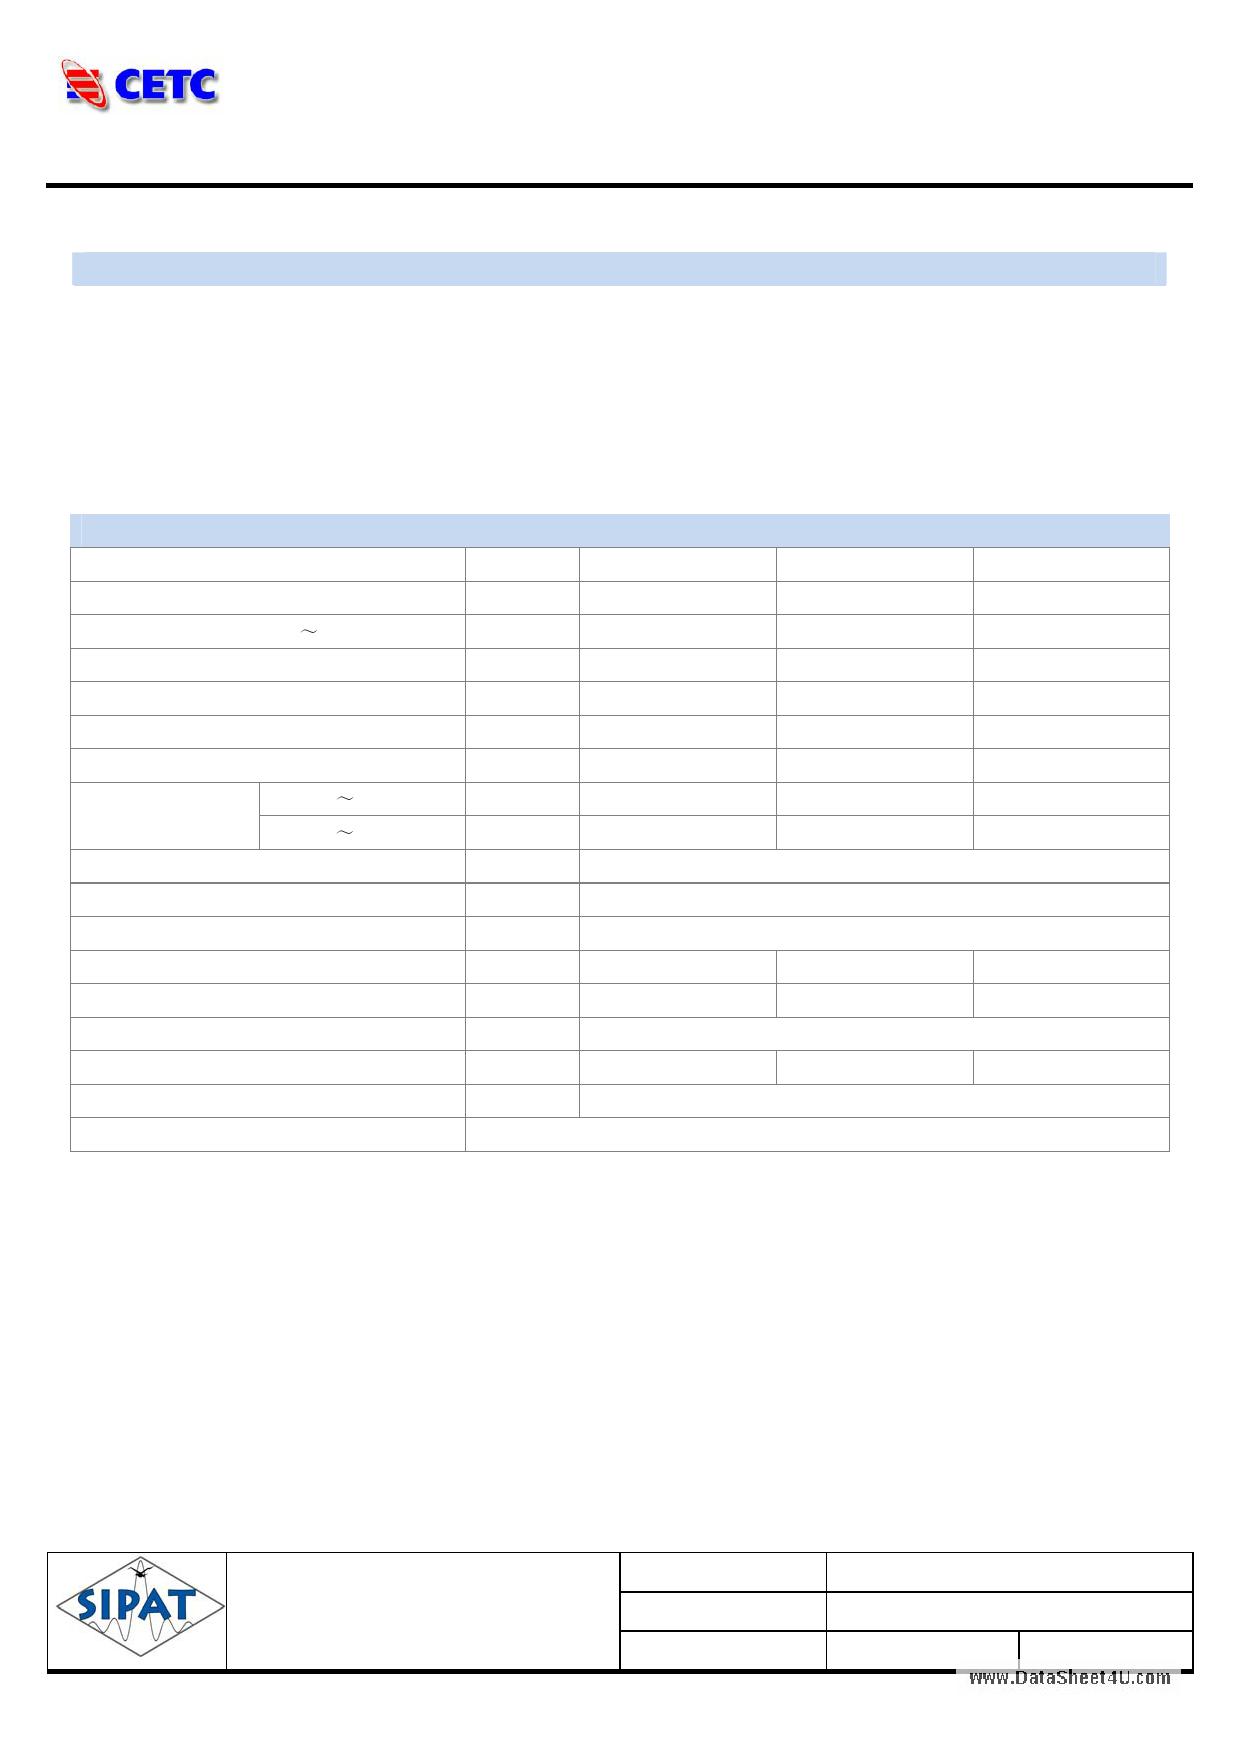 LBT92501 datasheet